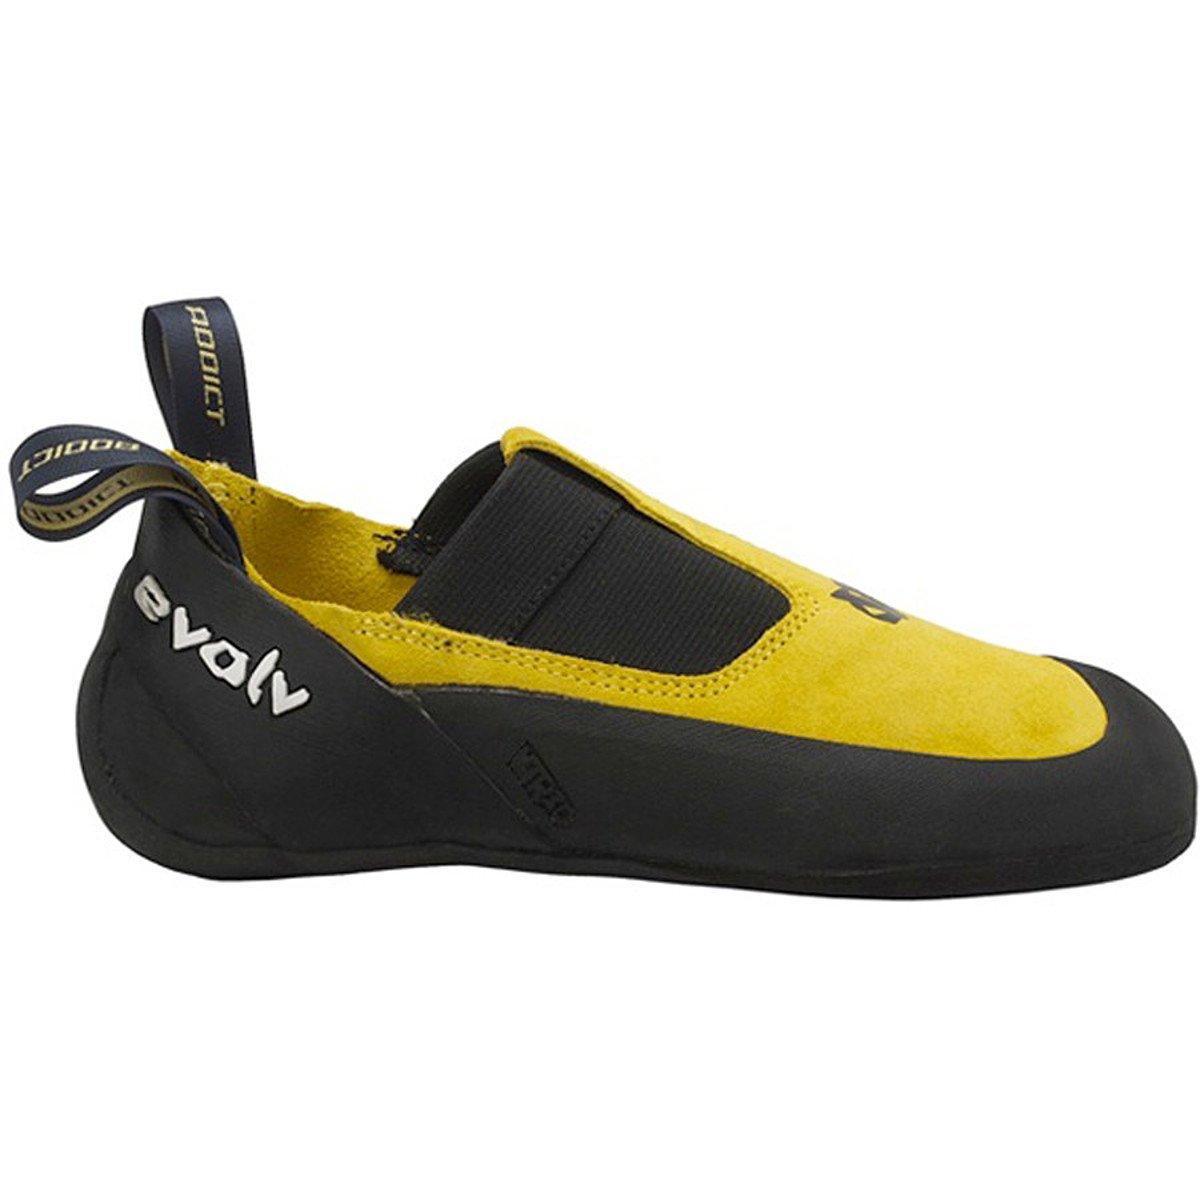 Evolv Addict Climbing Shoe 4.5 D(M) US イエロー B00E41RXJC